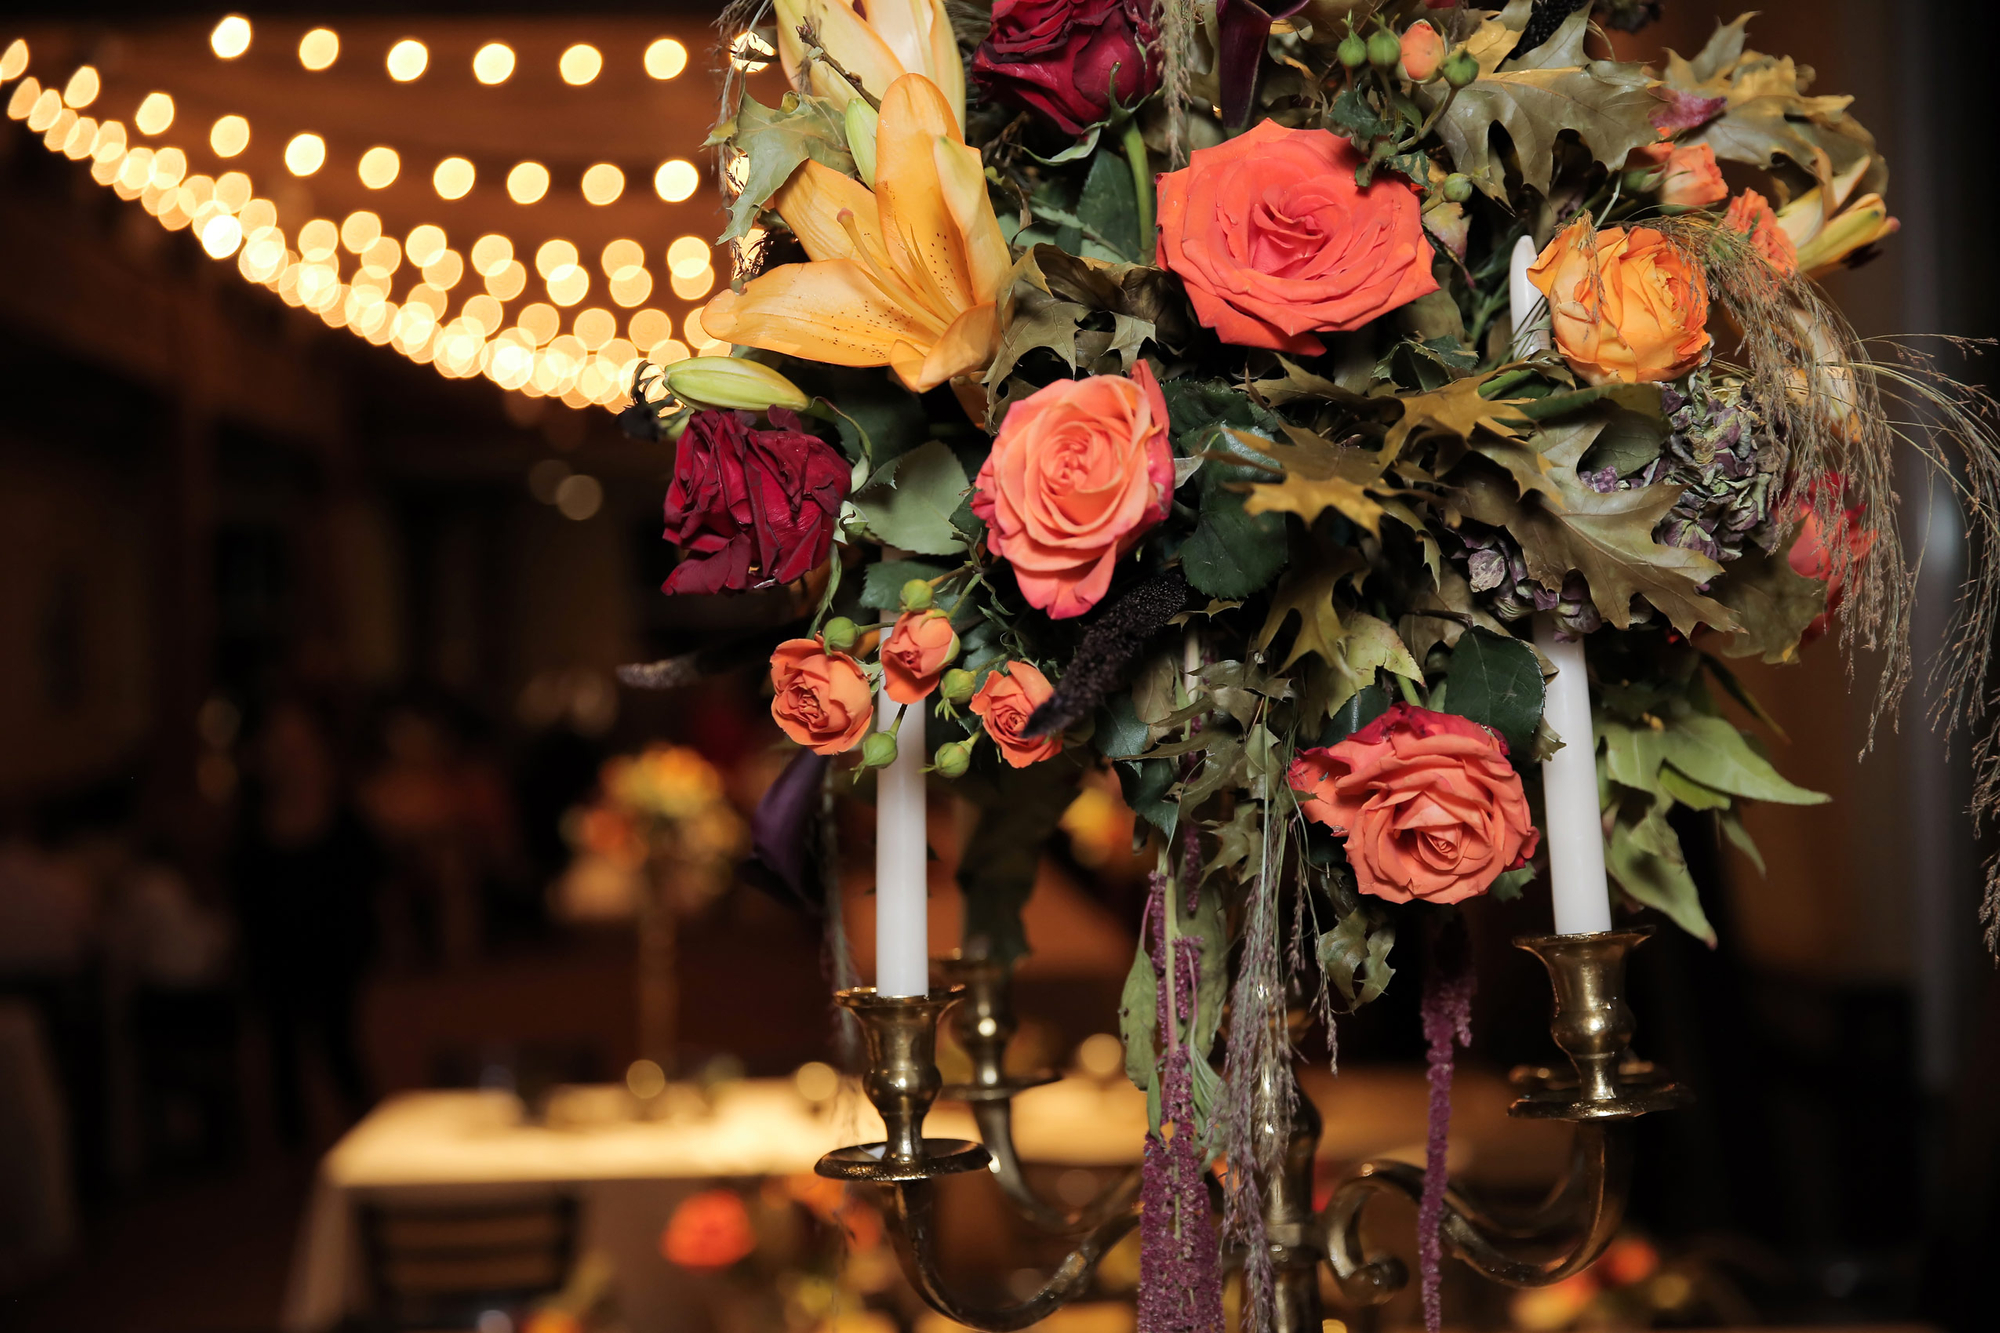 Felicia_Jared_Park_City_Mountain_Resort_Bistro_Lights_Flower_Arrangement.jpg